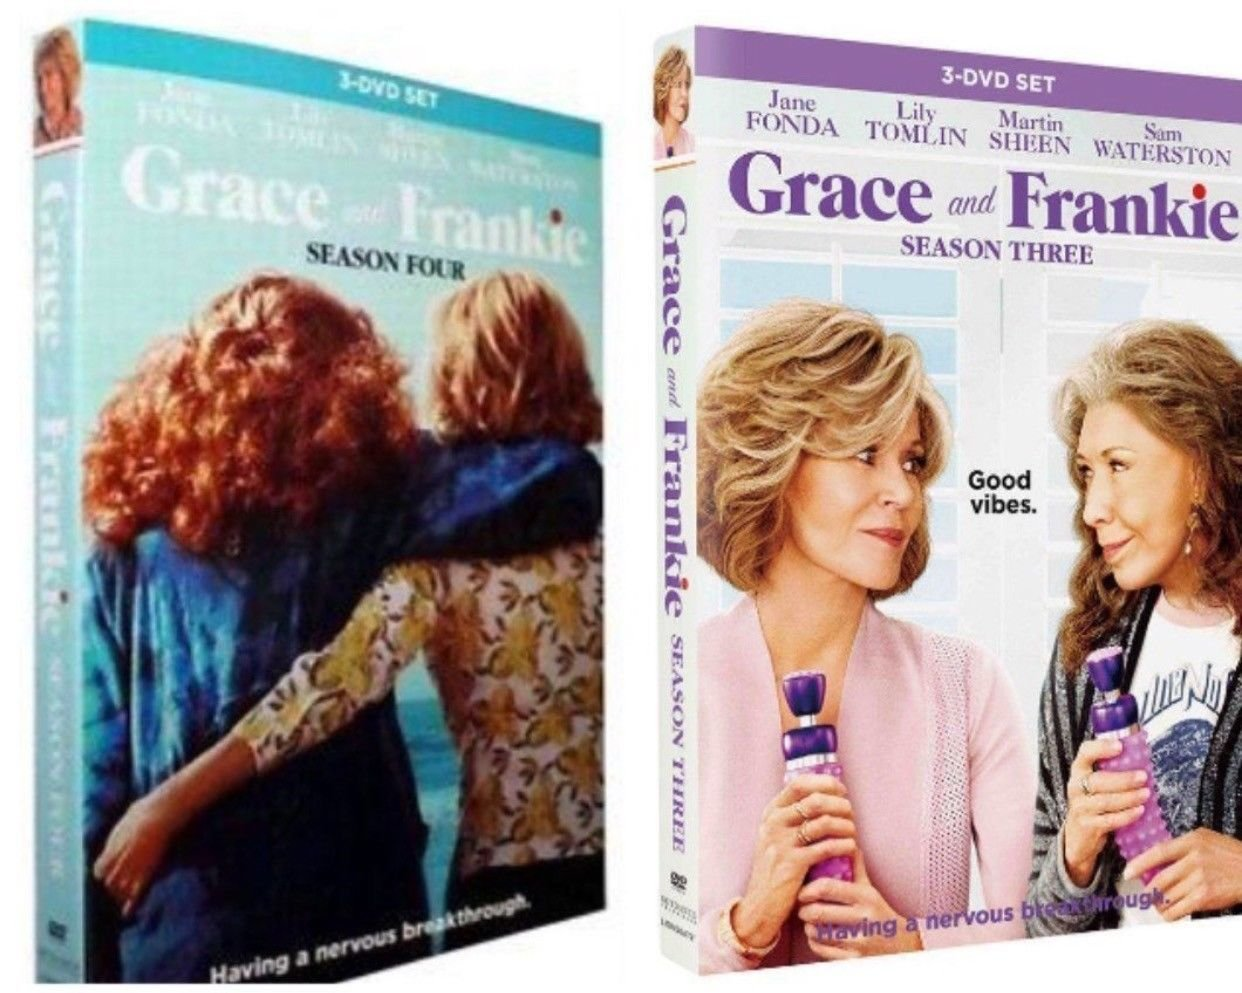 Grace and Frankie Seasons 3-4 (DVD)